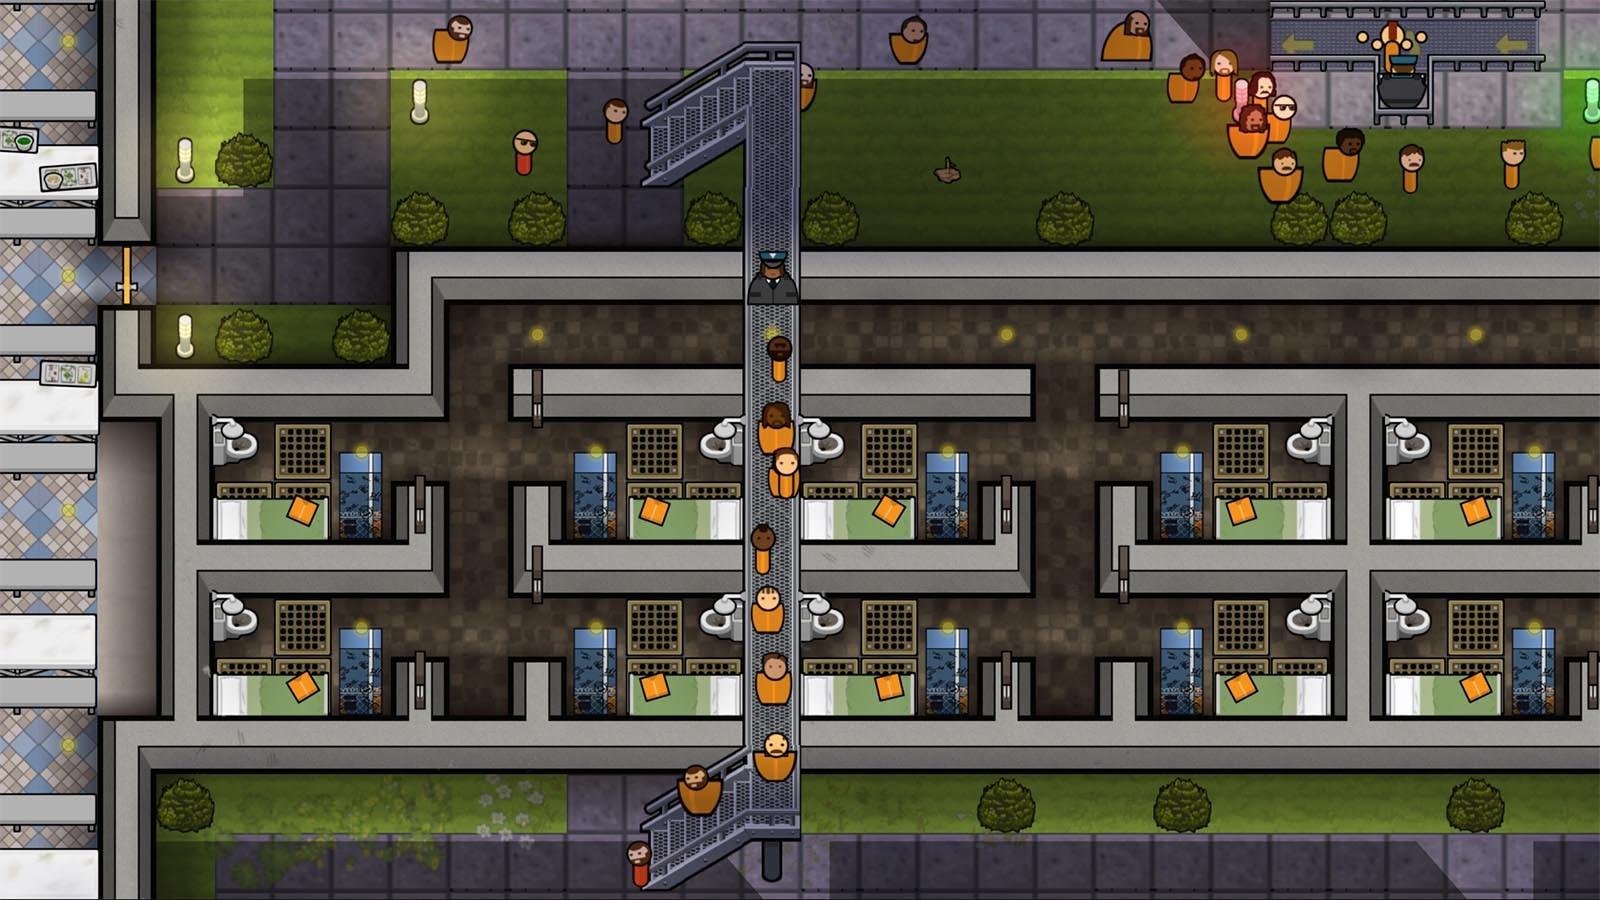 Prison Architect - Island Bound   ROW (ac746c32-cce6-48ce-9fa3-4037e776e6b5)